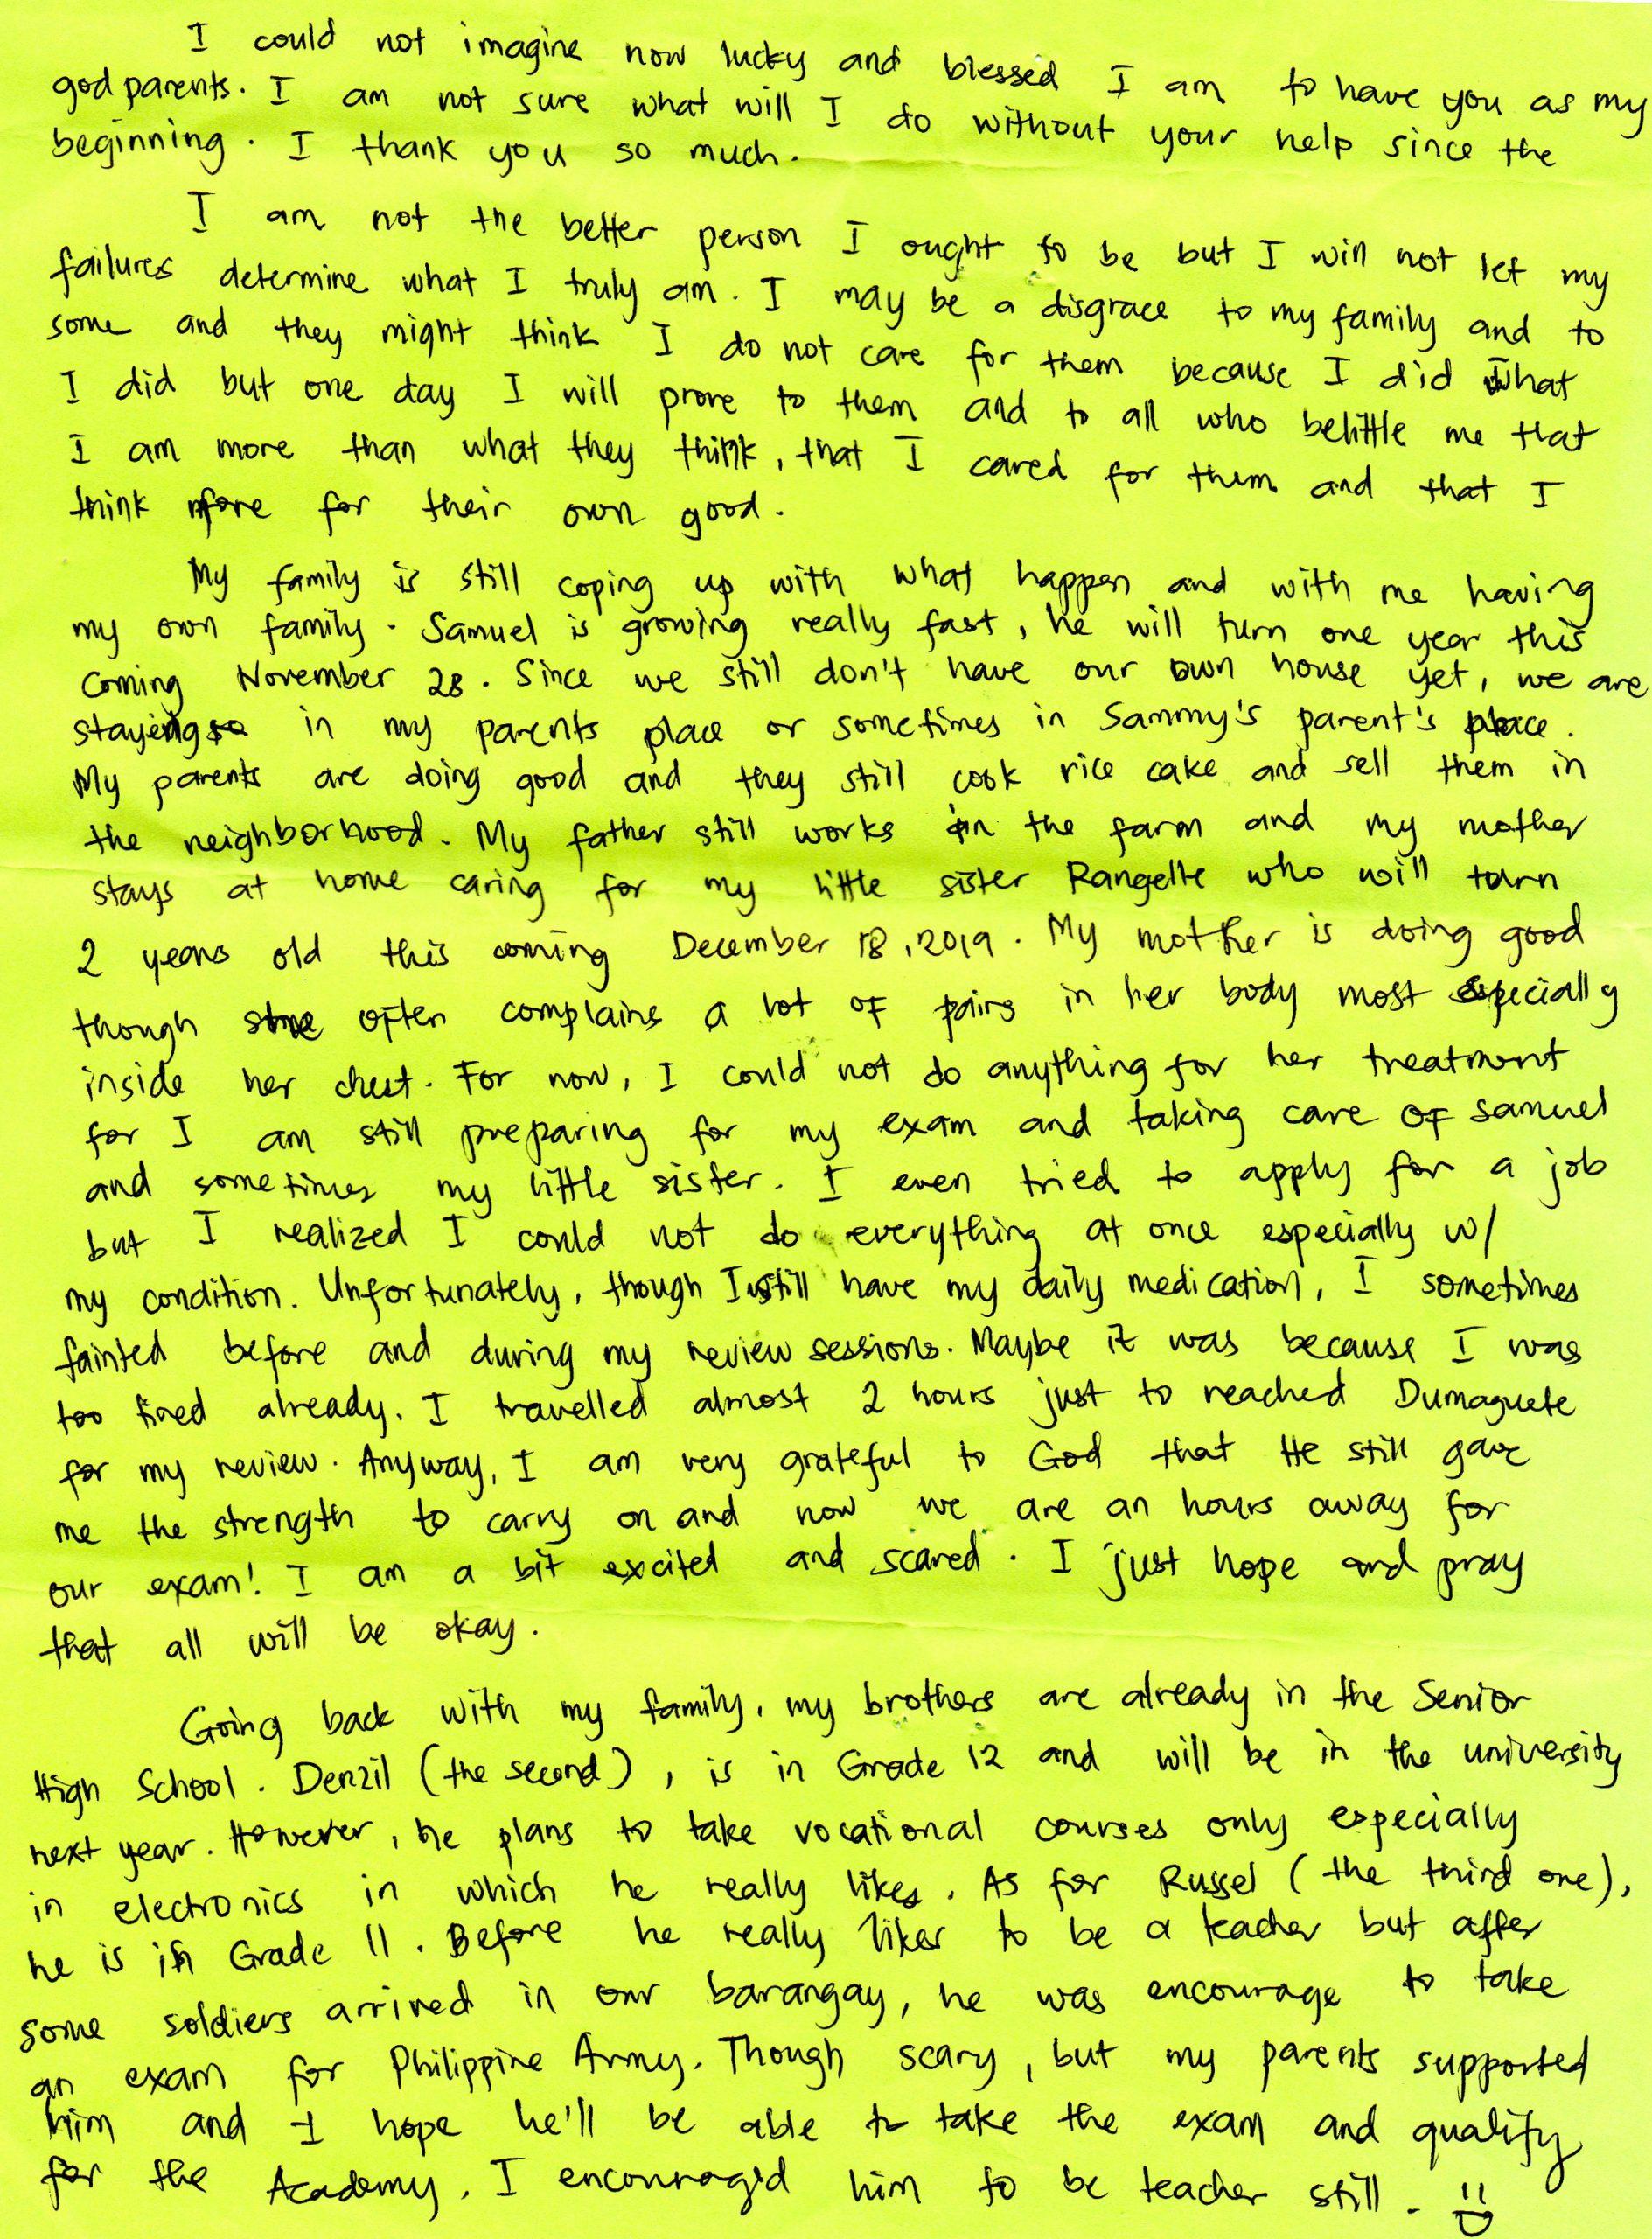 Suite lettre de Riaza, filleule philippine